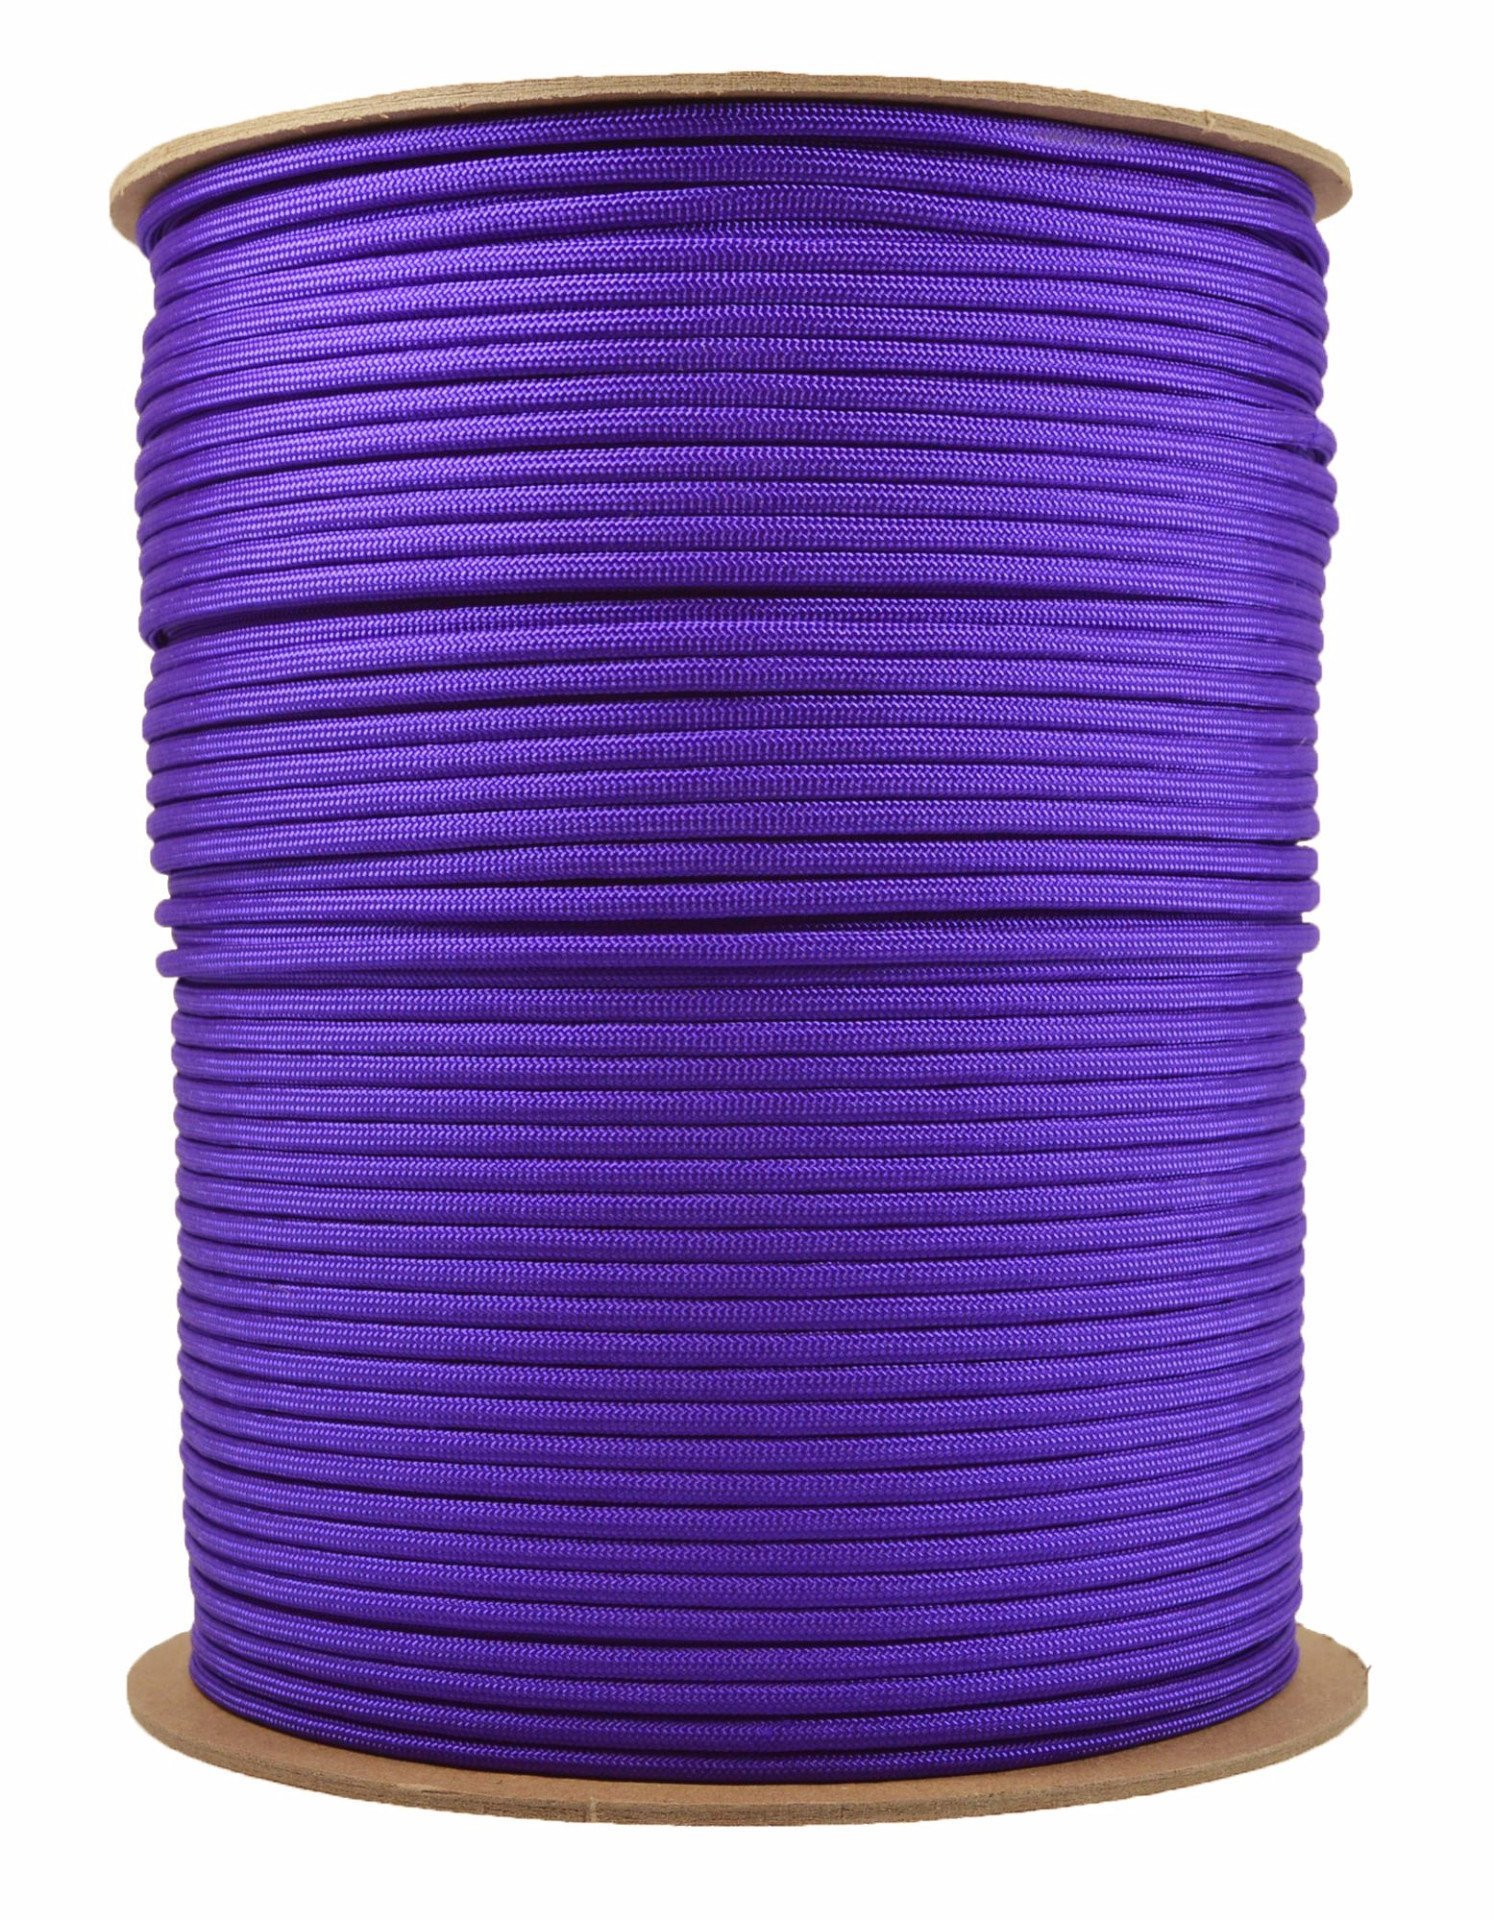 BoredParacord Brand Paracord (1000 ft. Spool) - Acid Purple by BoredParacord (Image #1)